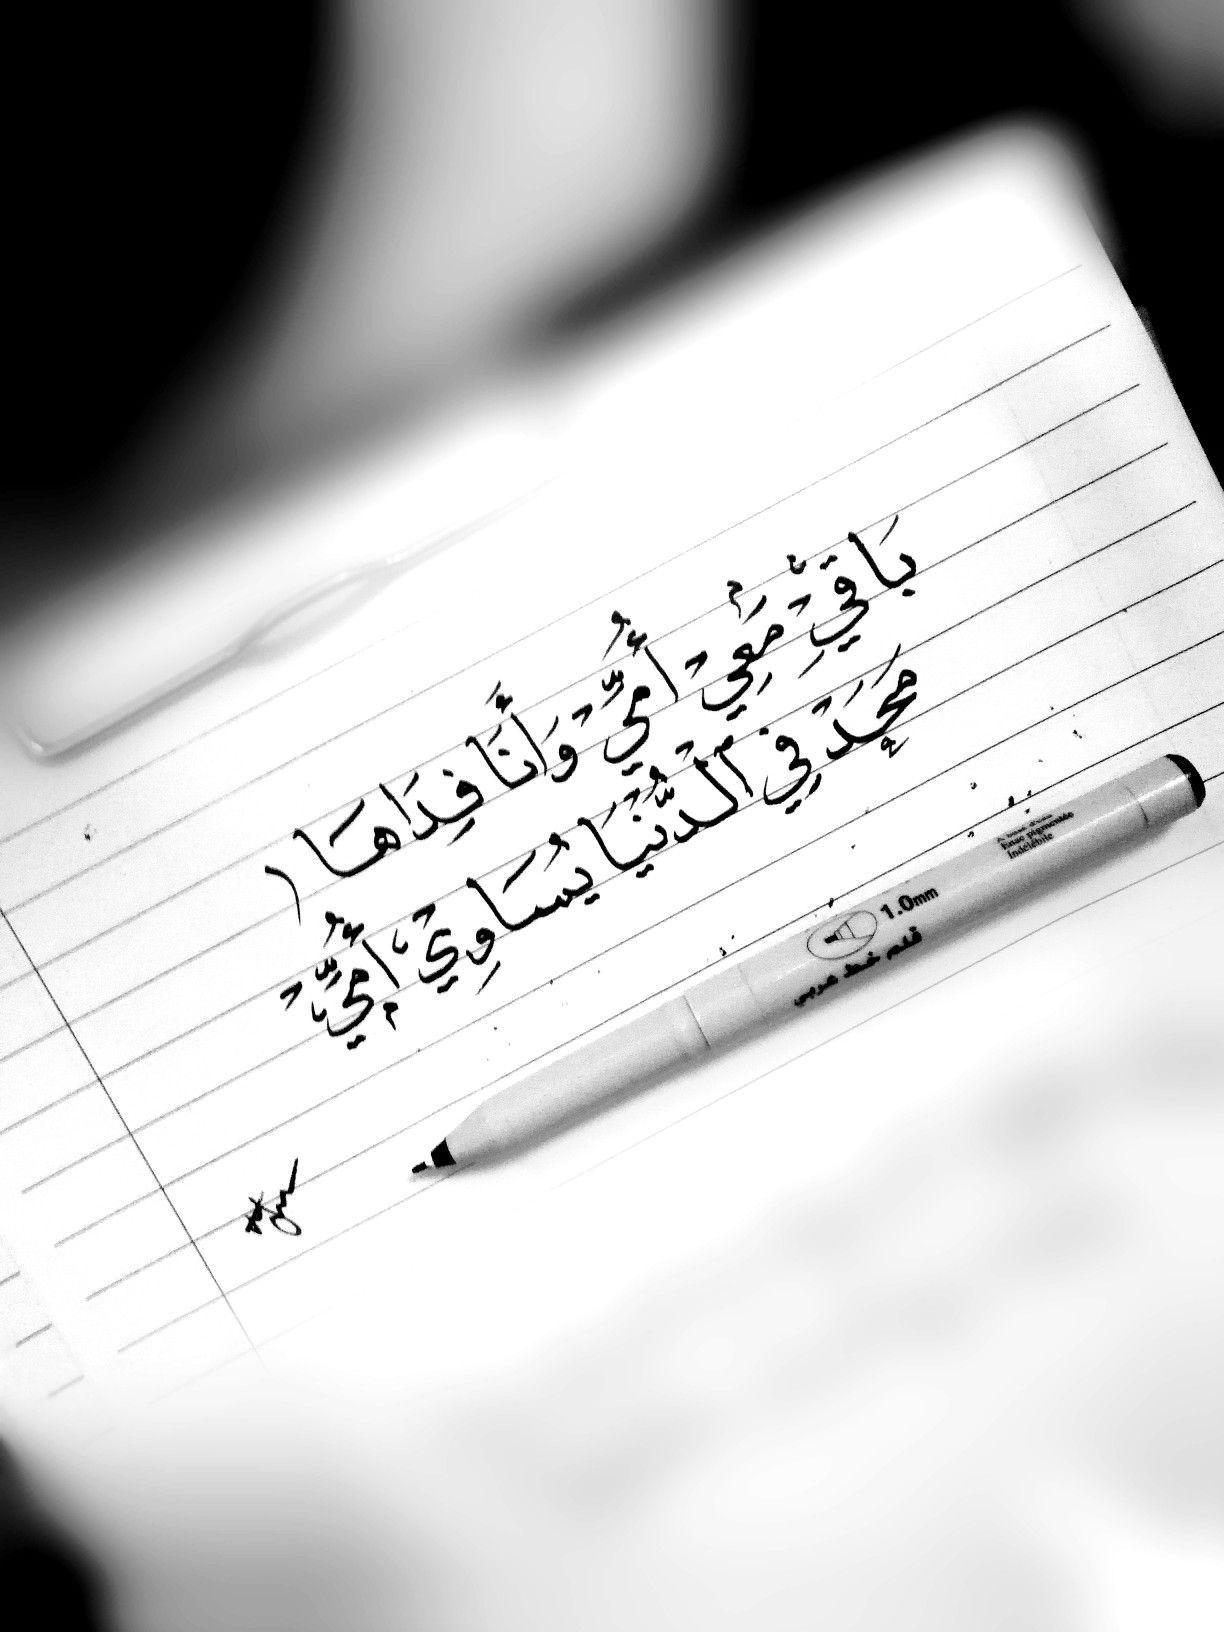 امي باقي معي امي وانا فداها محد في الدنيا يساوي امي Handwriting